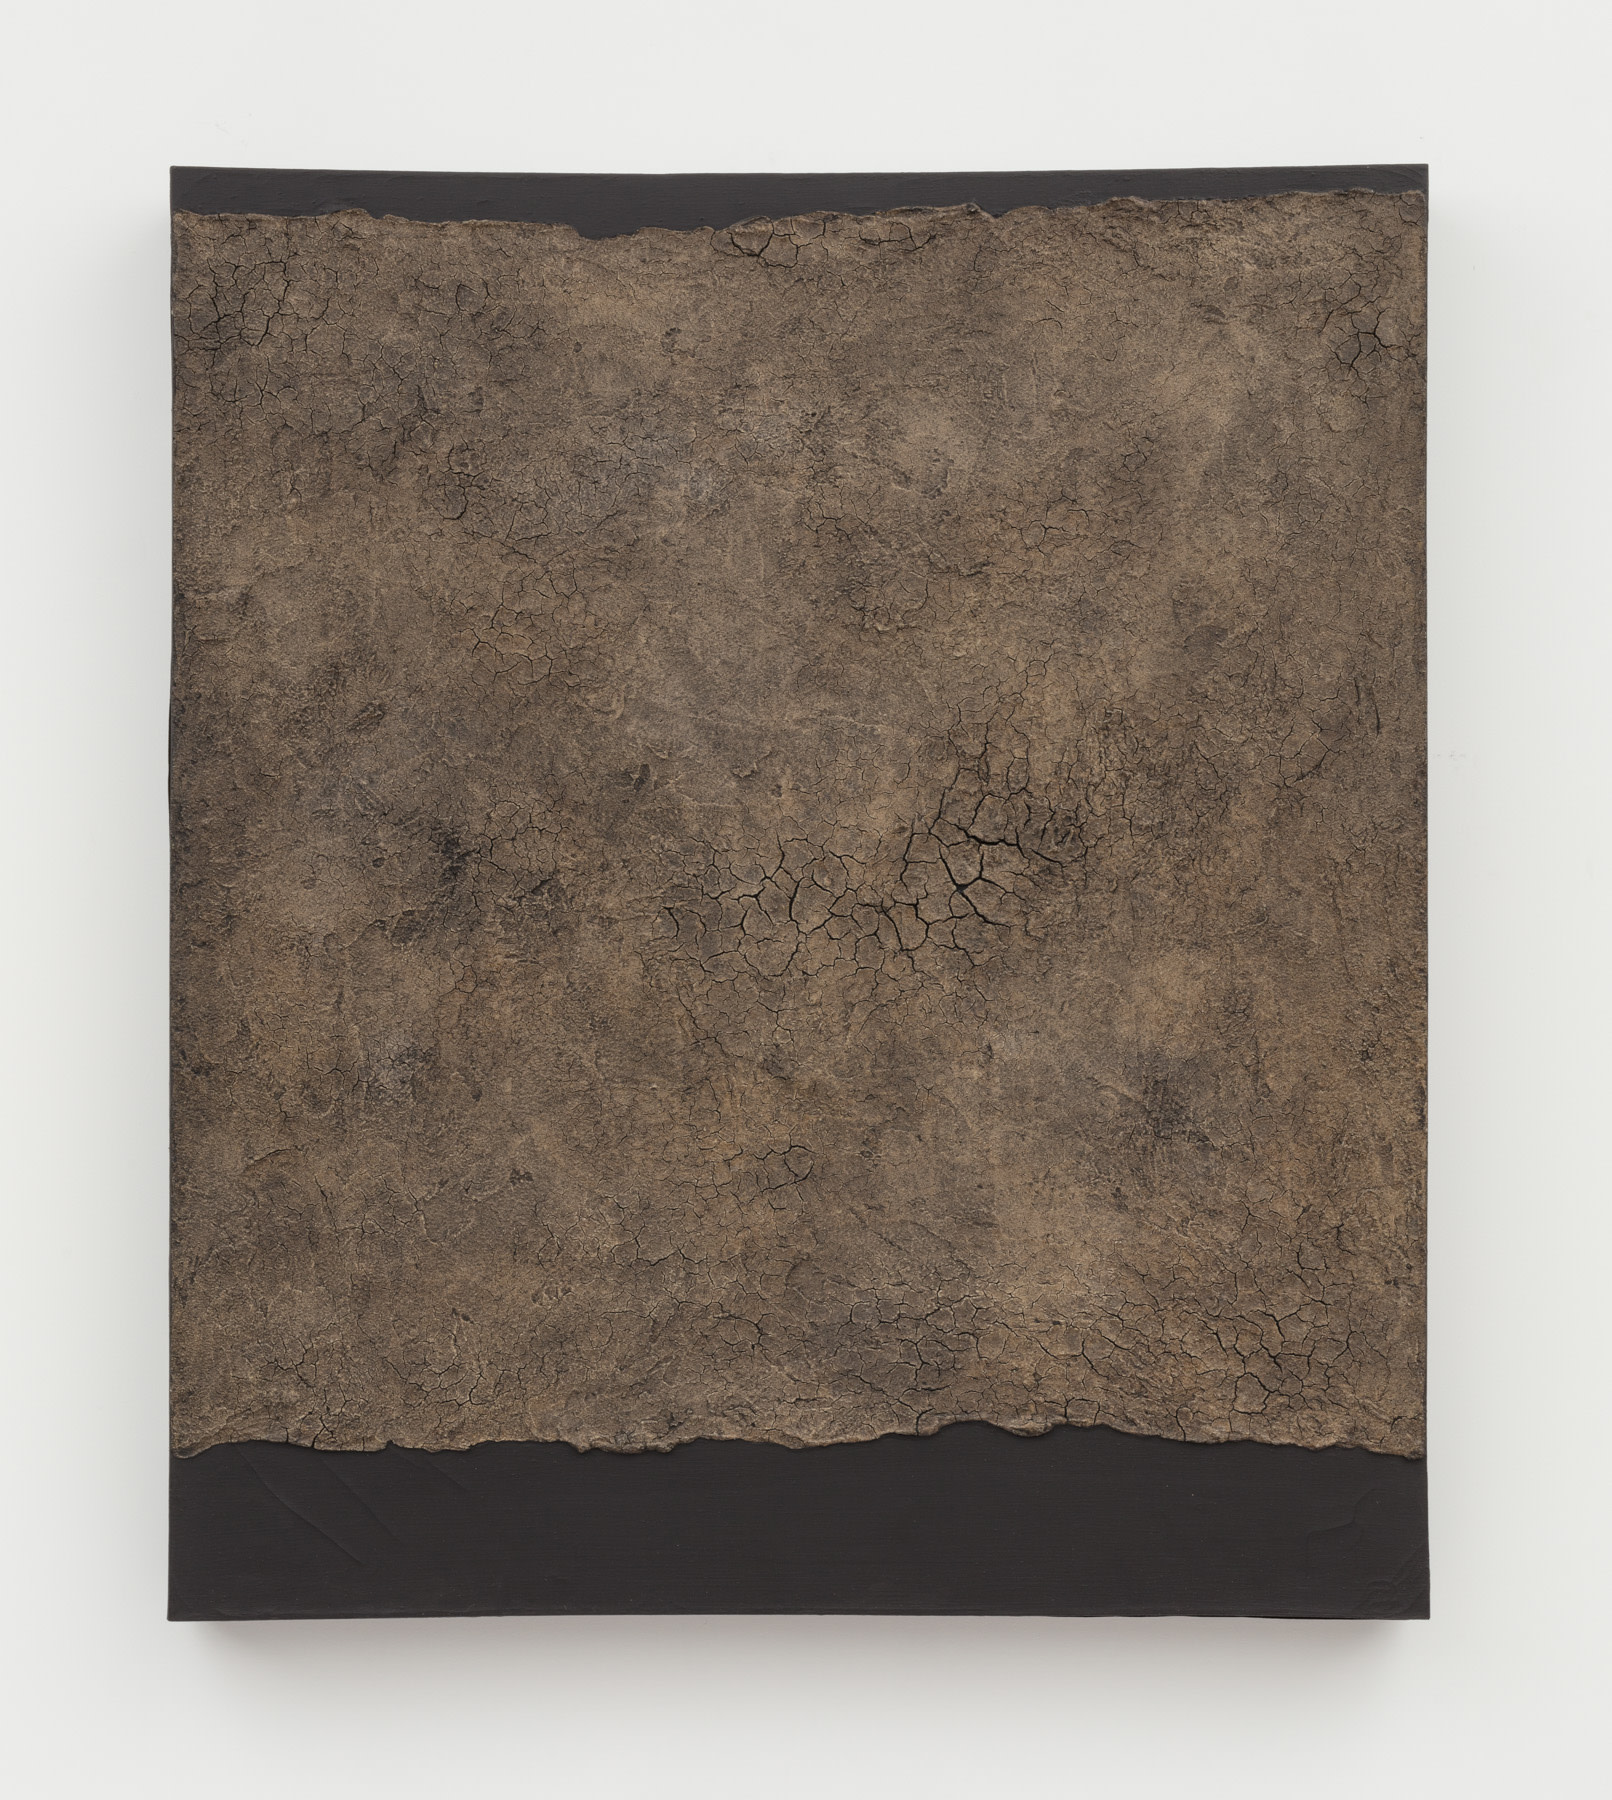 Terra Mancha, 1964